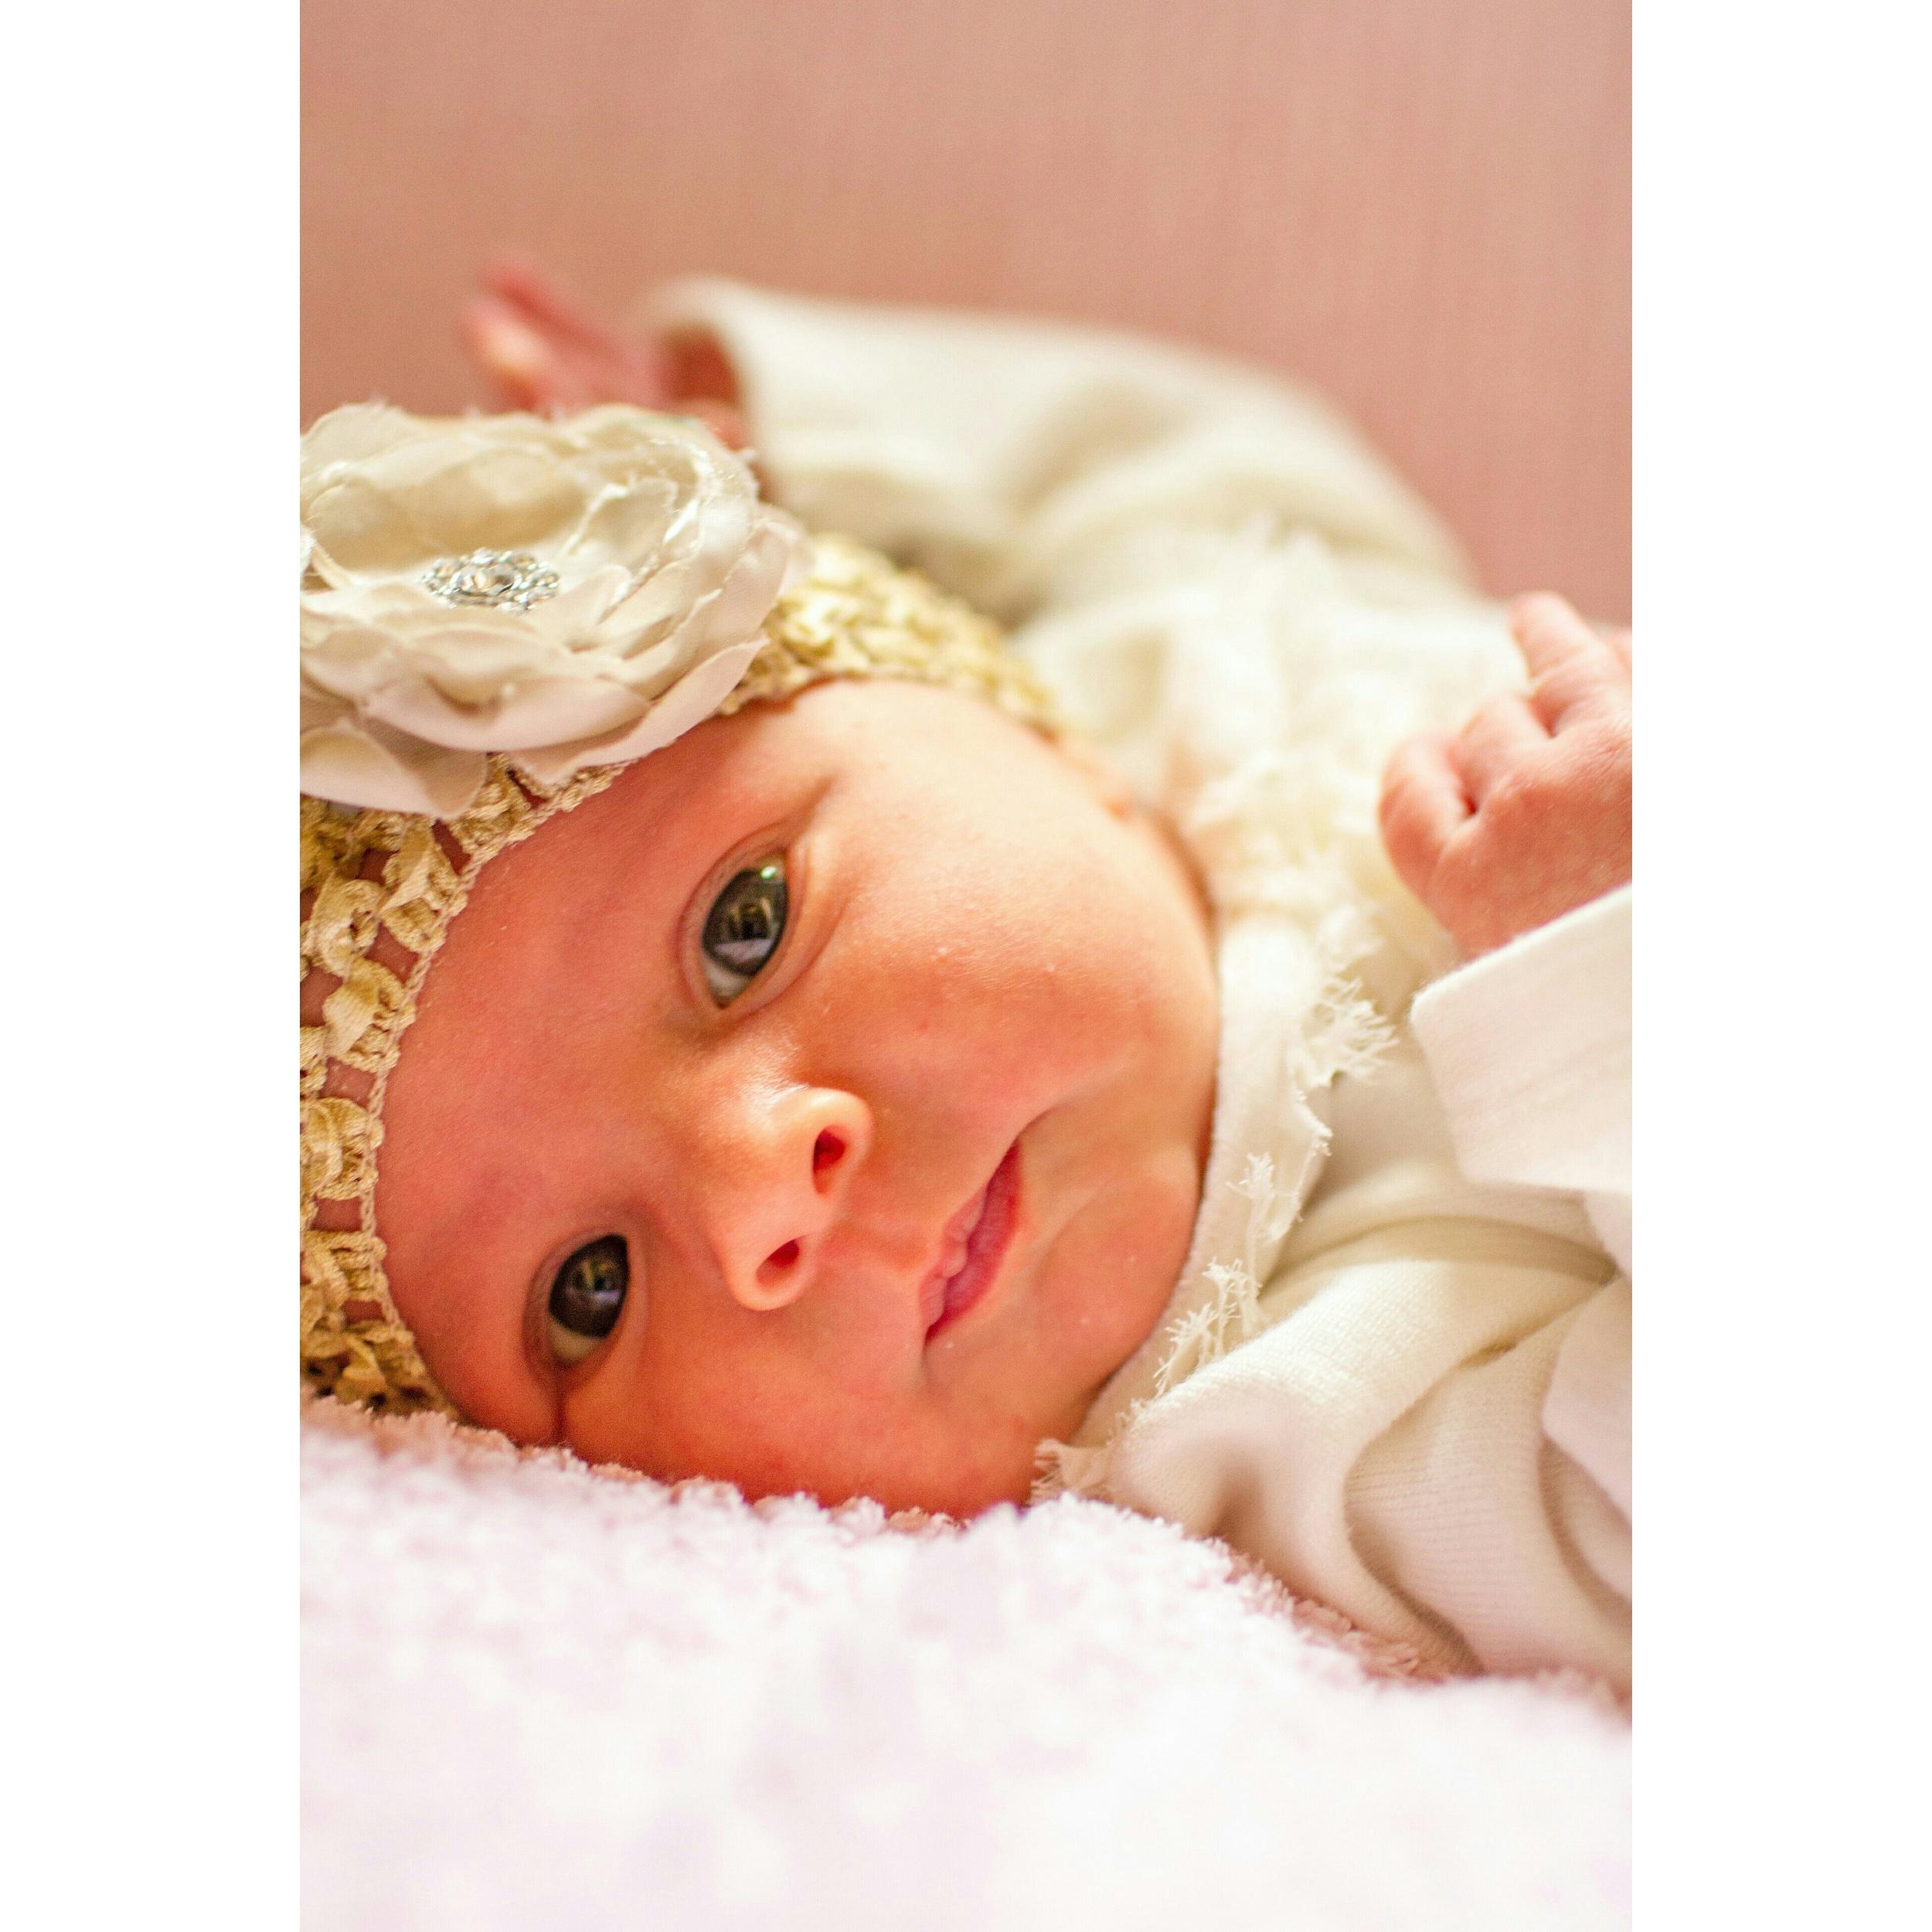 Baby Shiloh Fairweather